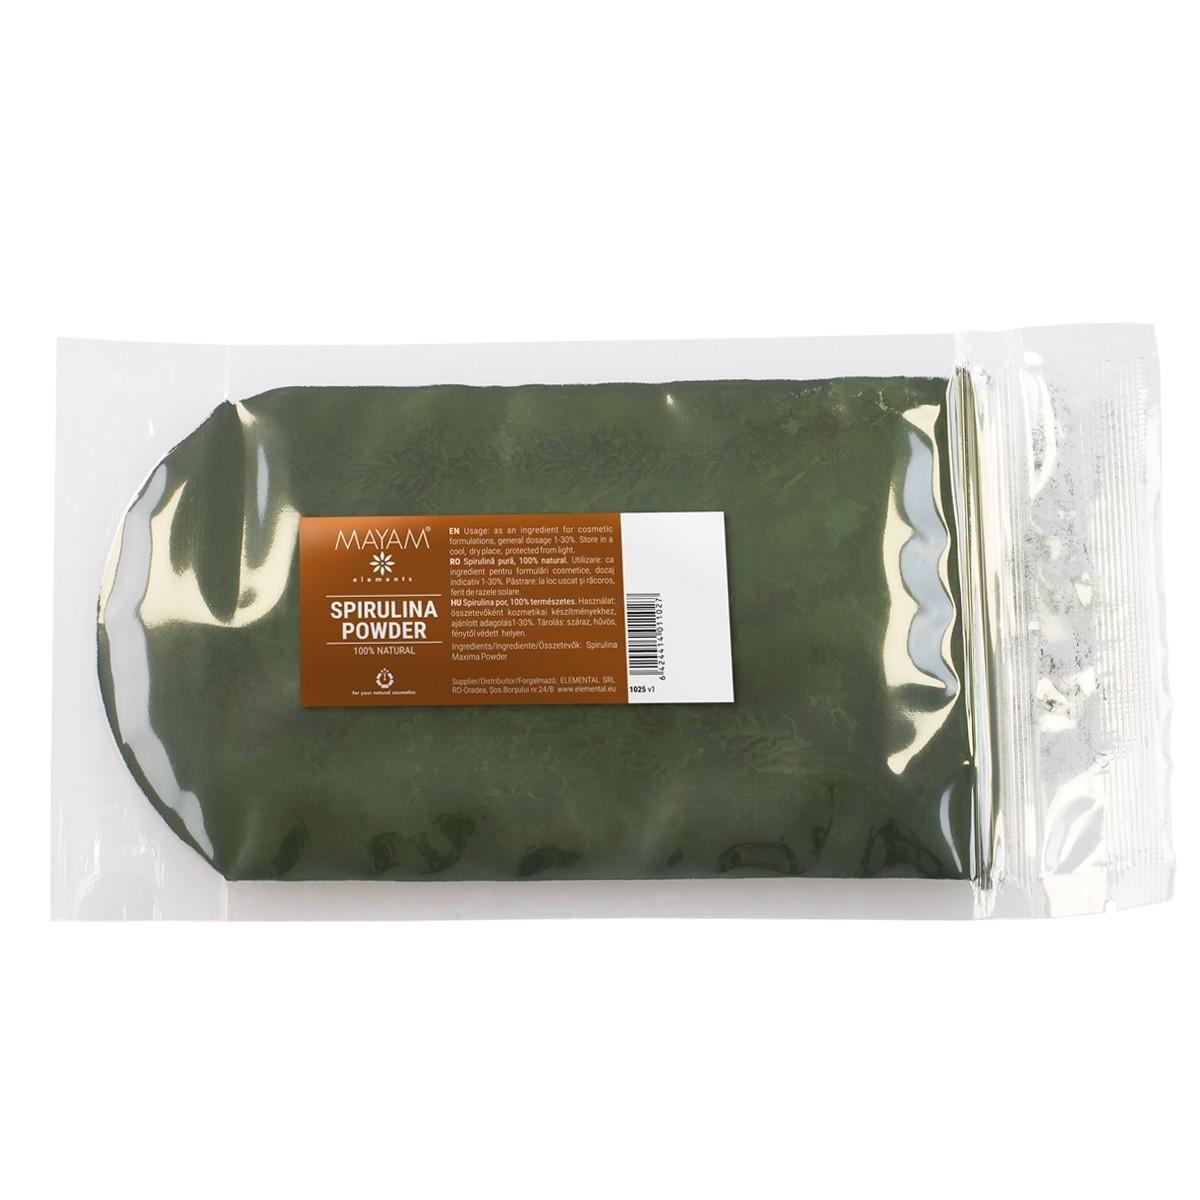 Spirulina powder 50g (cosmetic use)